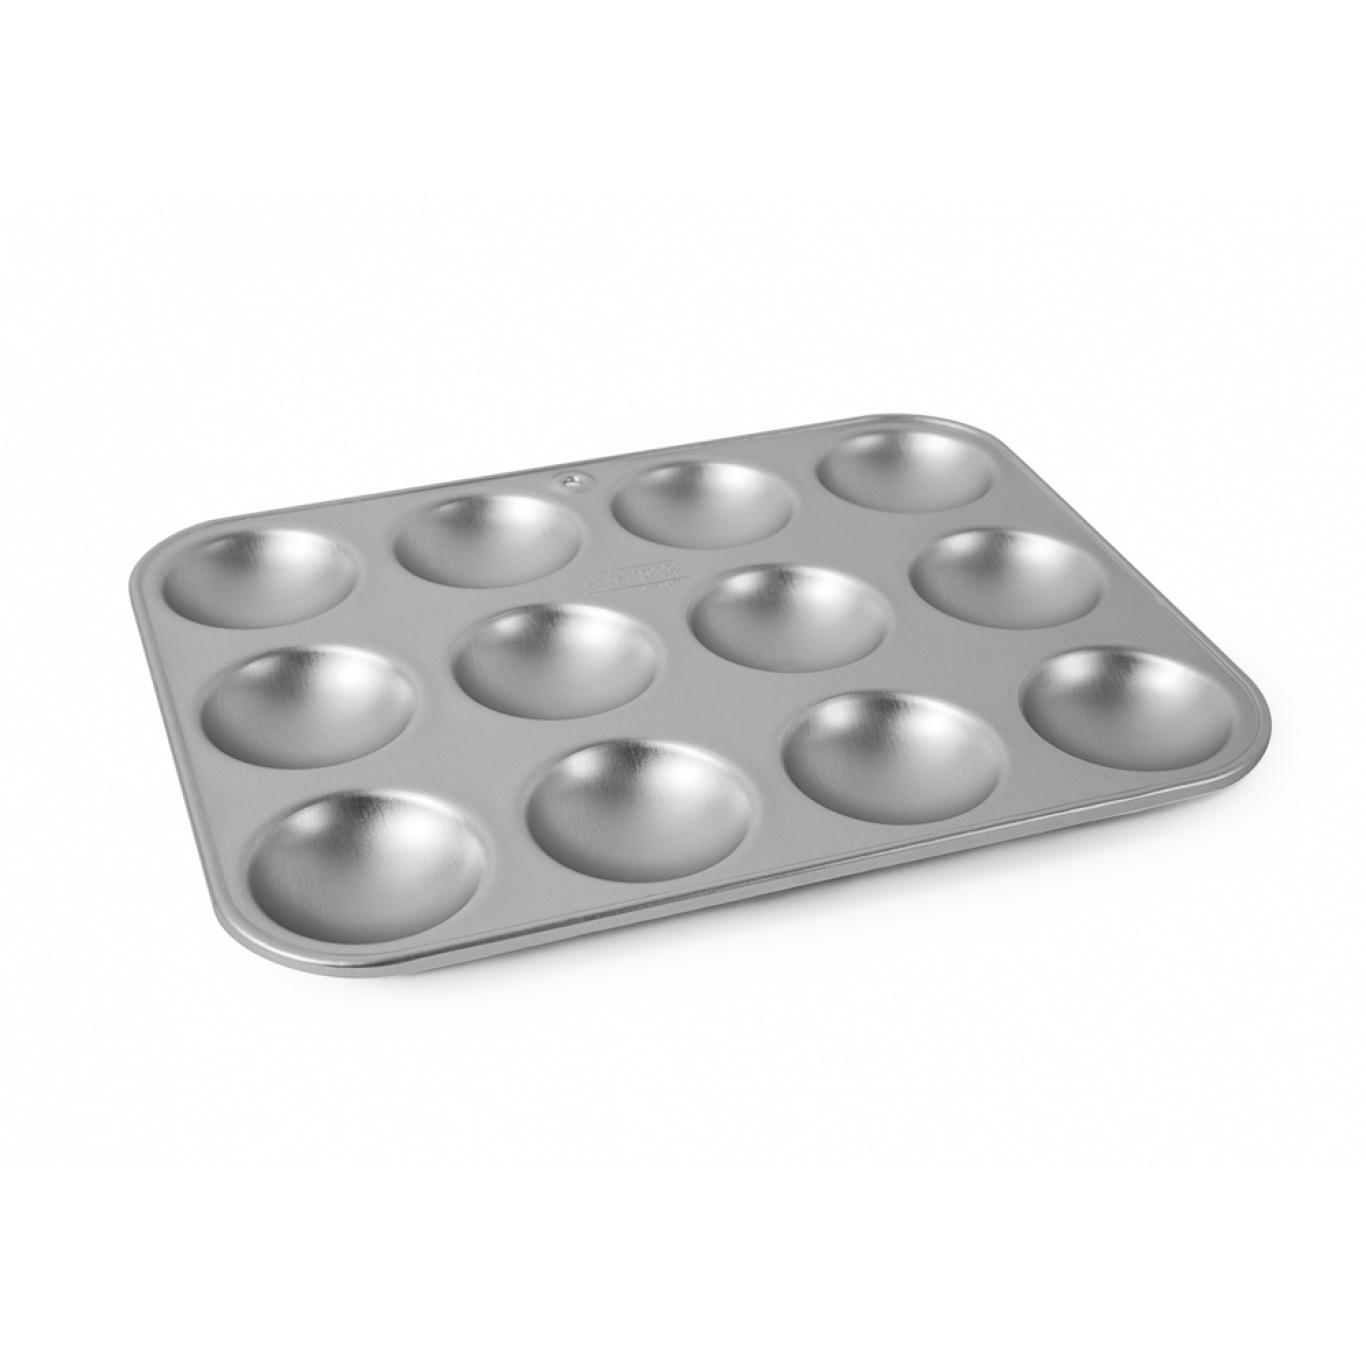 Image of  12 Hole Bun Tray